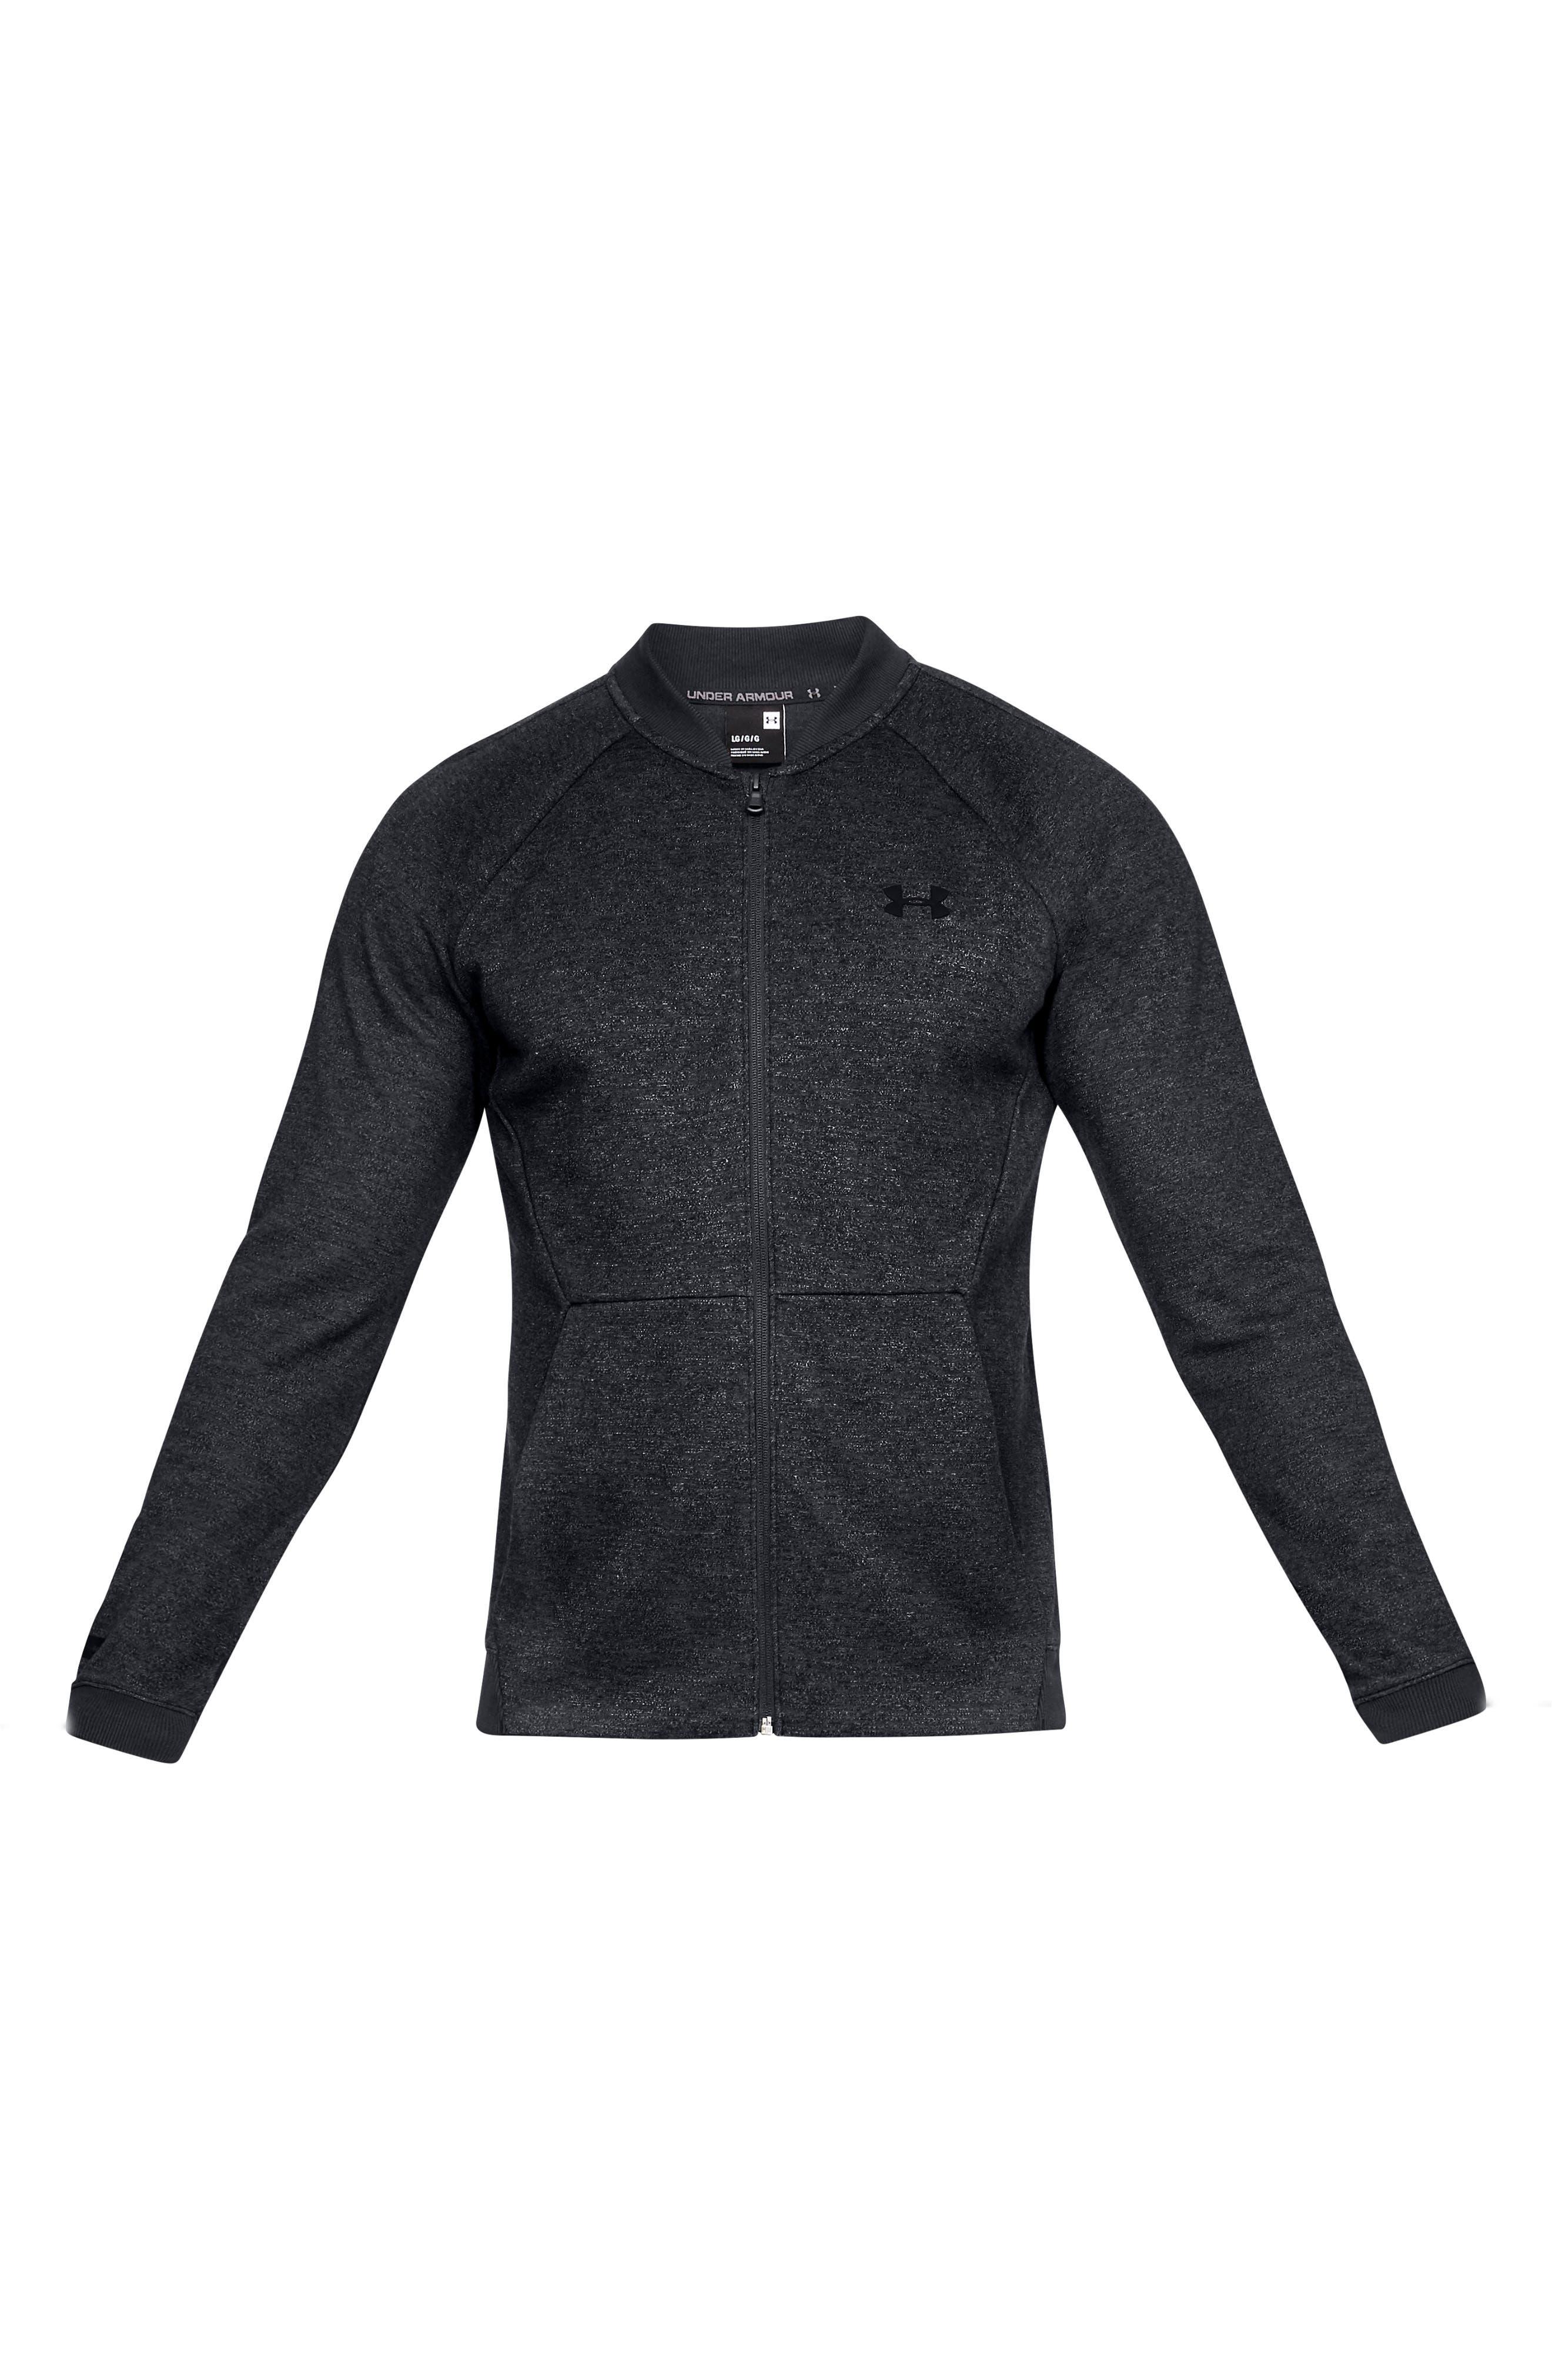 UNDER ARMOUR, Unstoppable Double Knit Bomber Jacket, Alternate thumbnail 5, color, BLACK/ BLACK/ BLACK